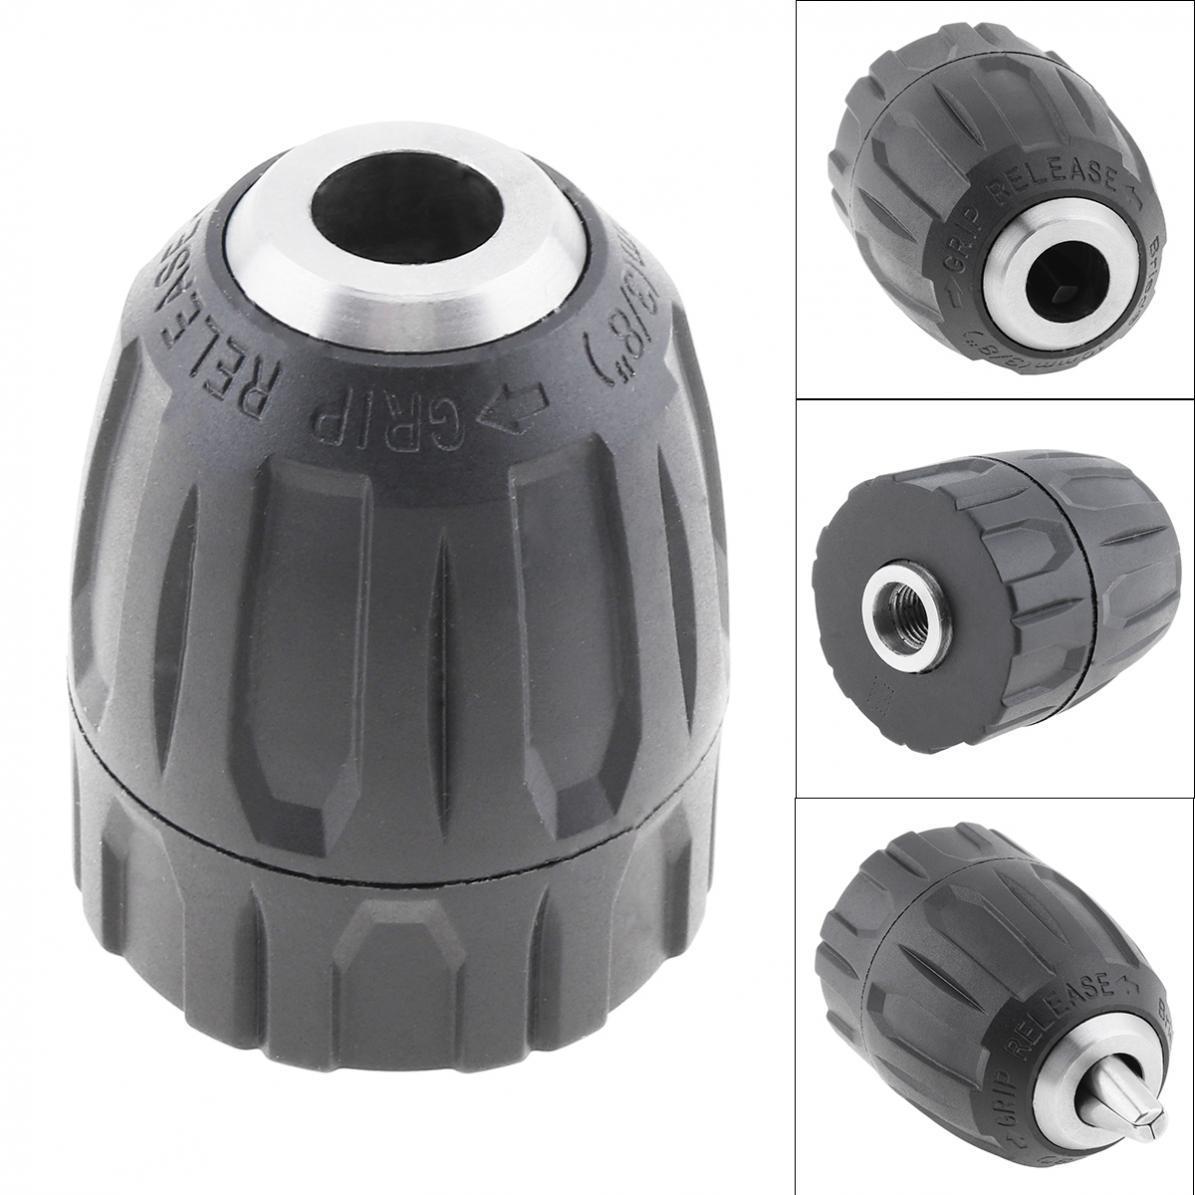 3//8-24UNF Connect 0.8mm-10mm Capacity Plastic Housing Keyless Drill Chuck